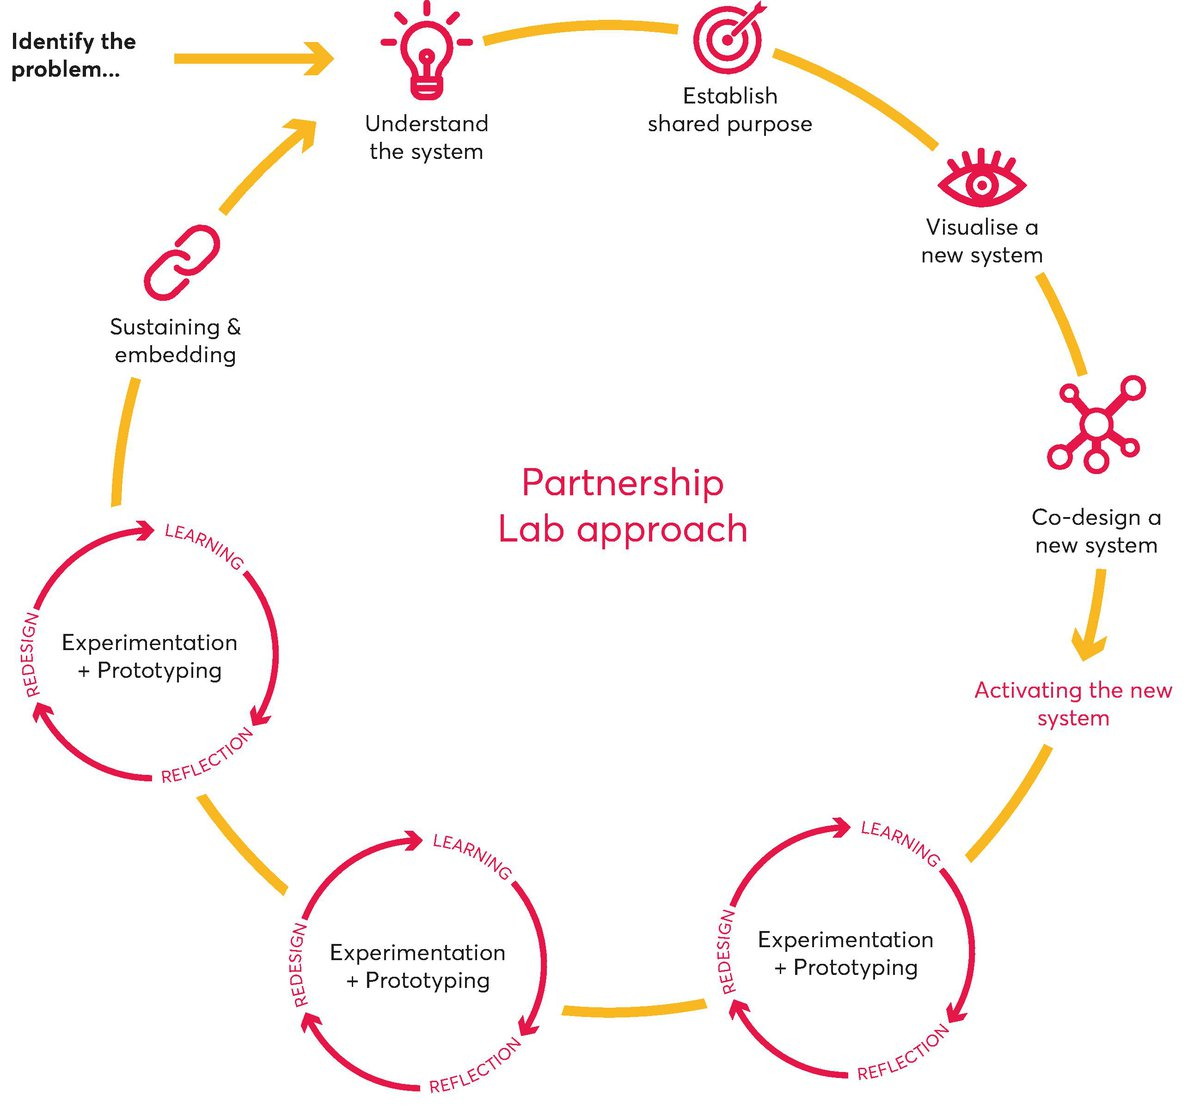 aPartnership Lab approach_3.pdf